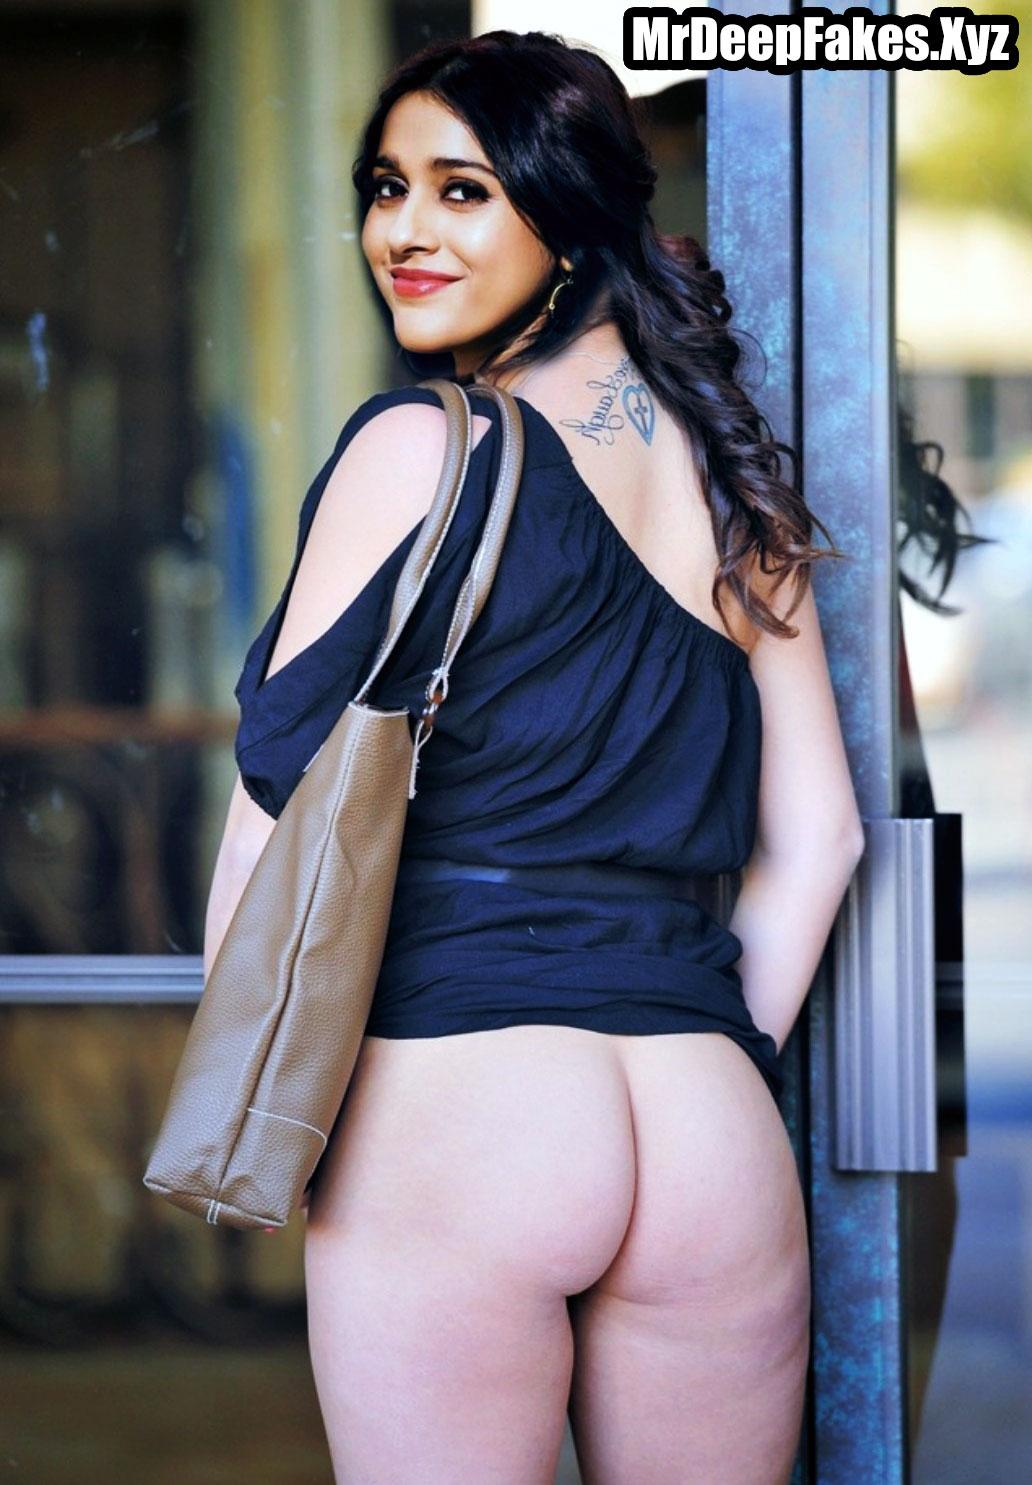 Rashmi Gautam sexy nude white ass without undies outdoor shoot